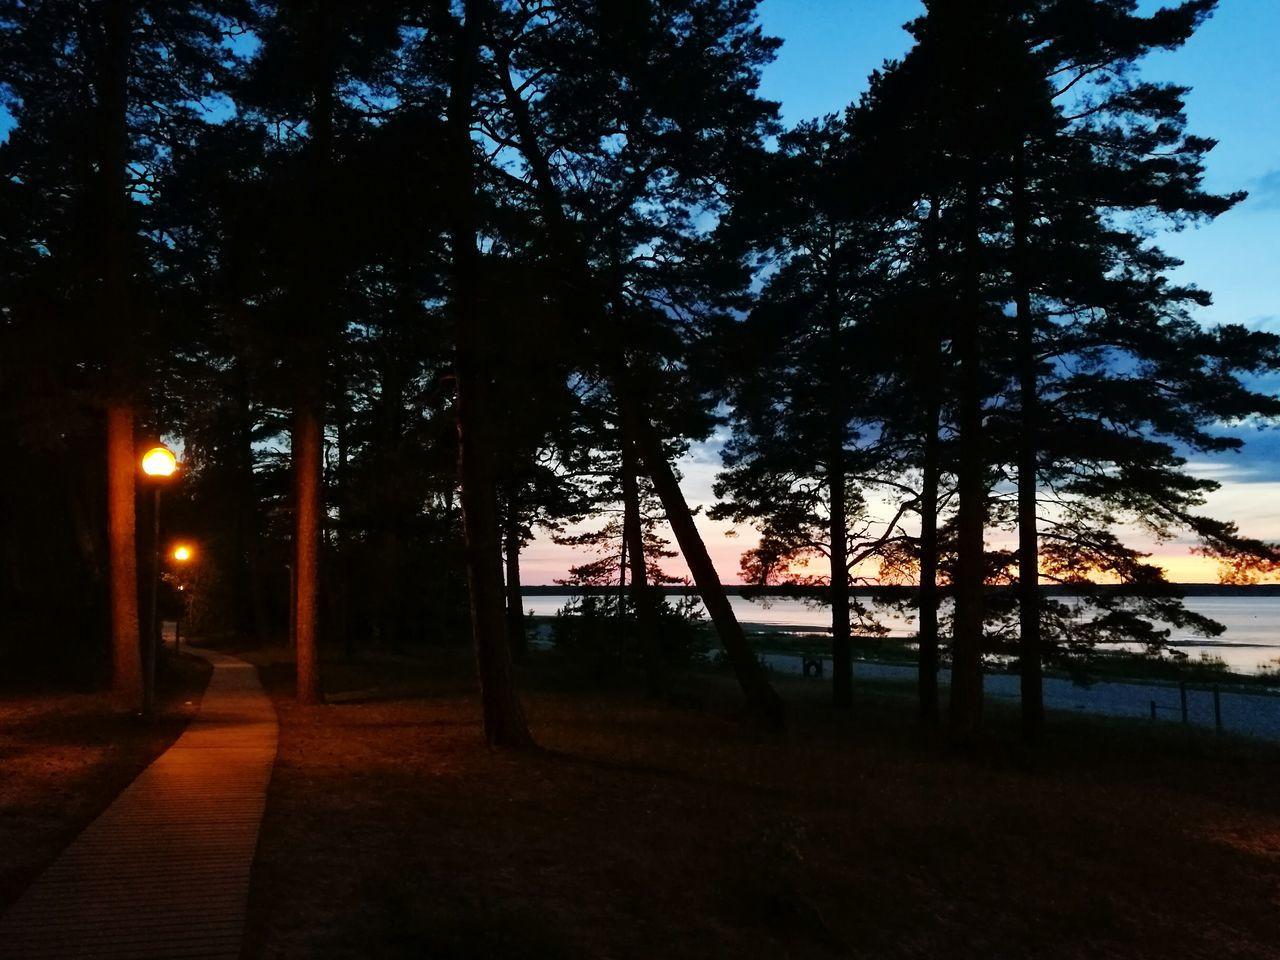 tree, night, nature, no people, tranquility, tree trunk, outdoors, beauty in nature, illuminated, scenics, sky